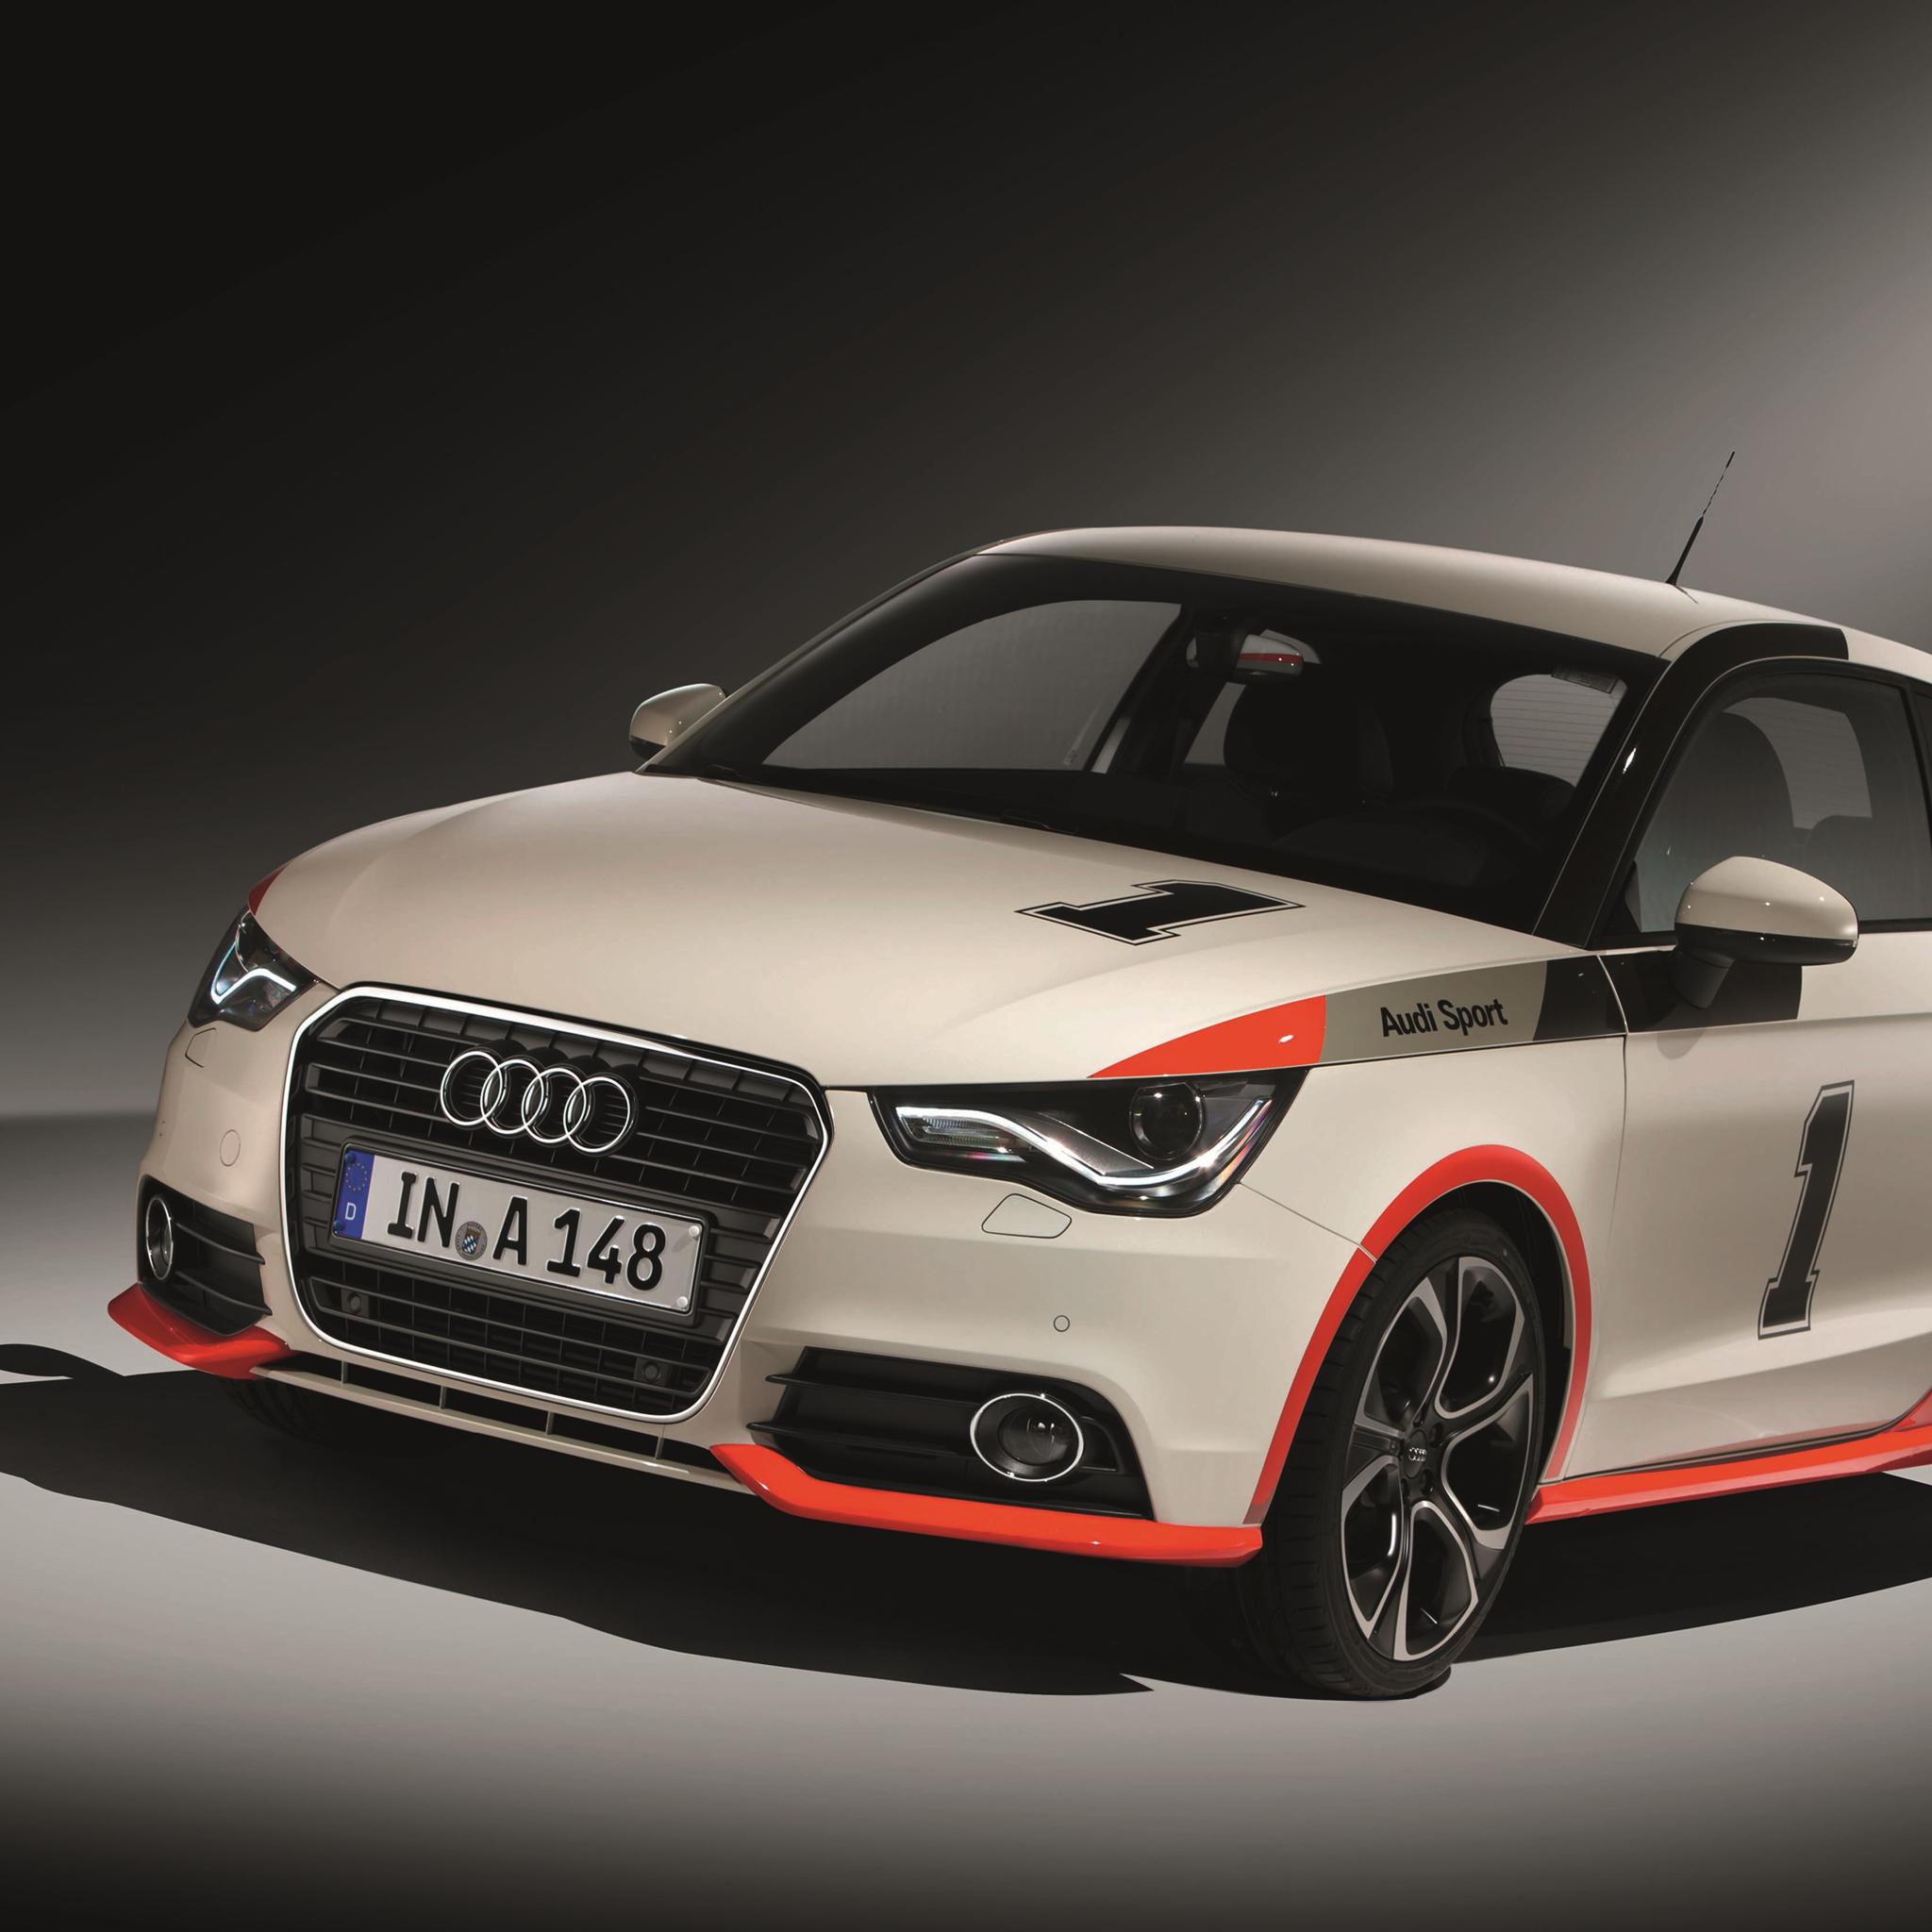 Audi-A1-Sports-3Wallpapers-iPad-Retina